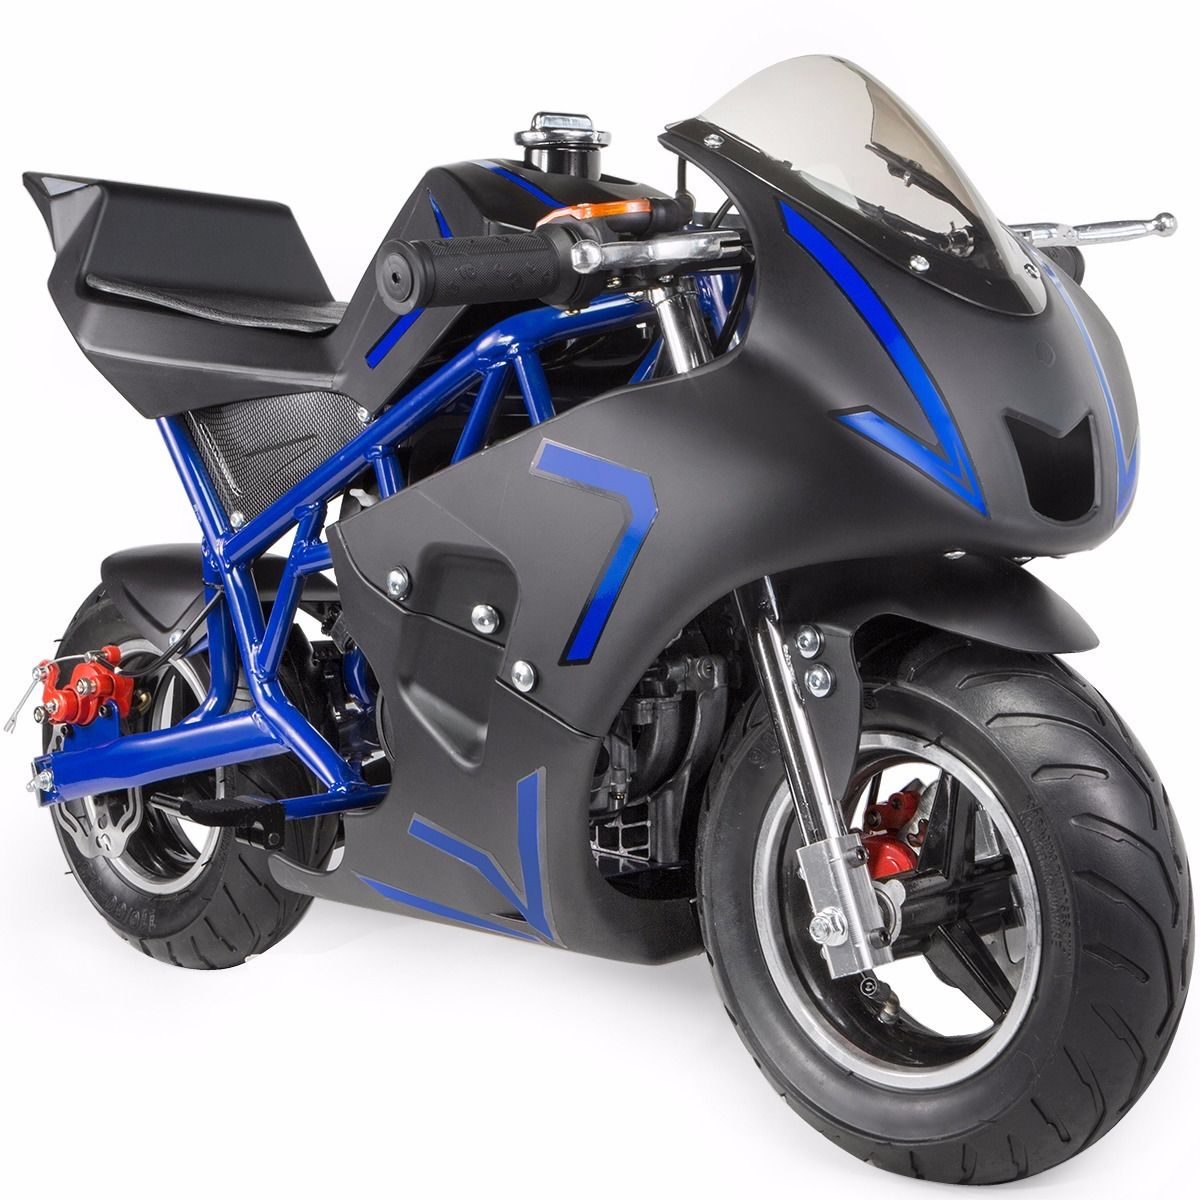 XtremepowerUS-Gas-Pocket-Bike-Motor-Bike-Scooter-40cc-Epa-Engine-Motorcycle thumbnail 9